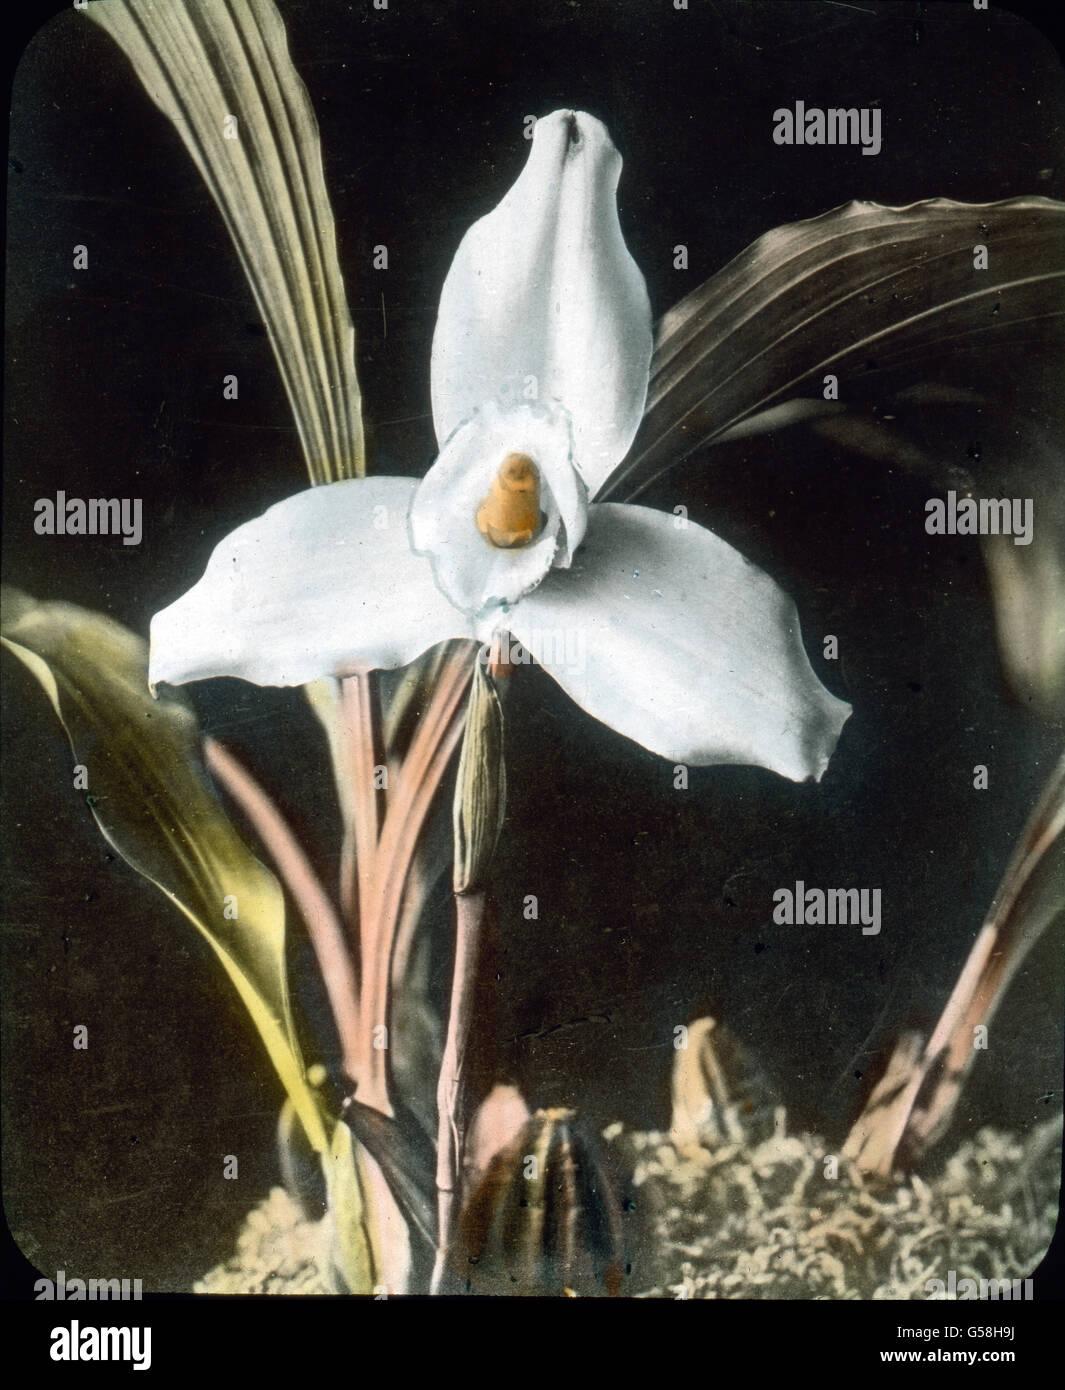 Eine Orchideenart, mit reizendem Farbenspiel. India, Asia, viajes, botánica, orquídea, flor, flor, historia, Imagen De Stock